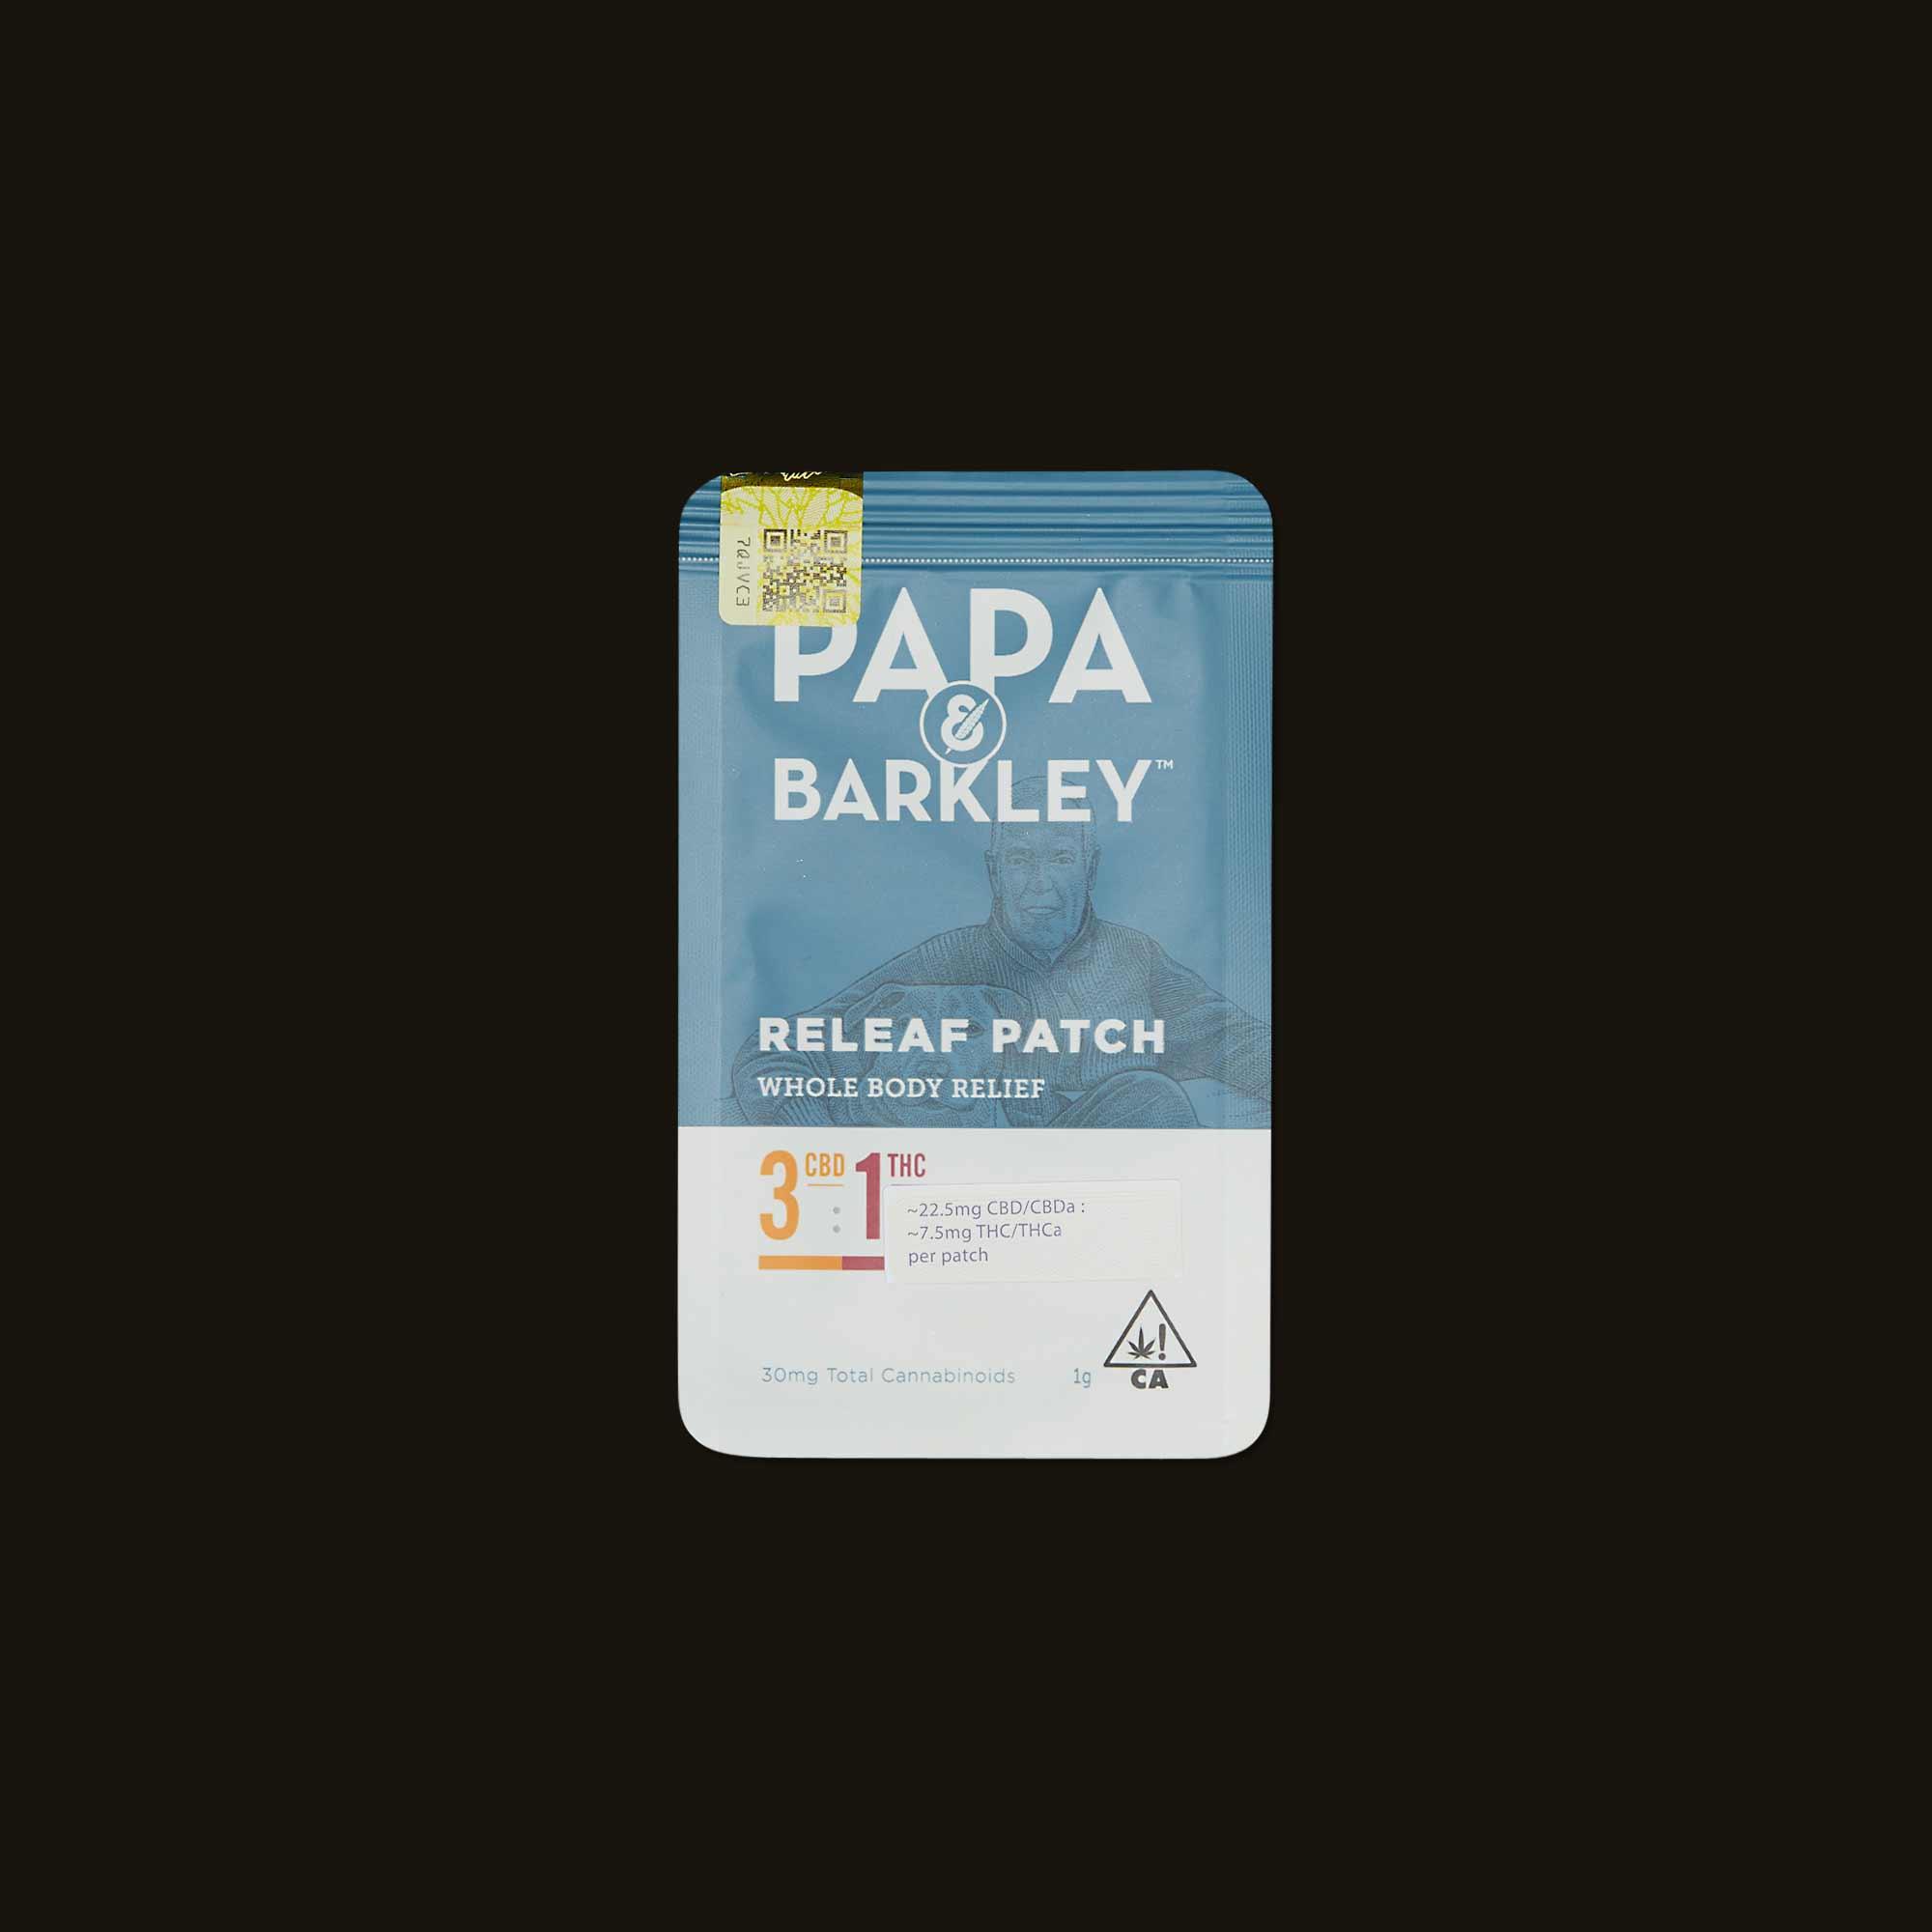 Papa & Barkley 3:1 CBD:THC Releaf Patch